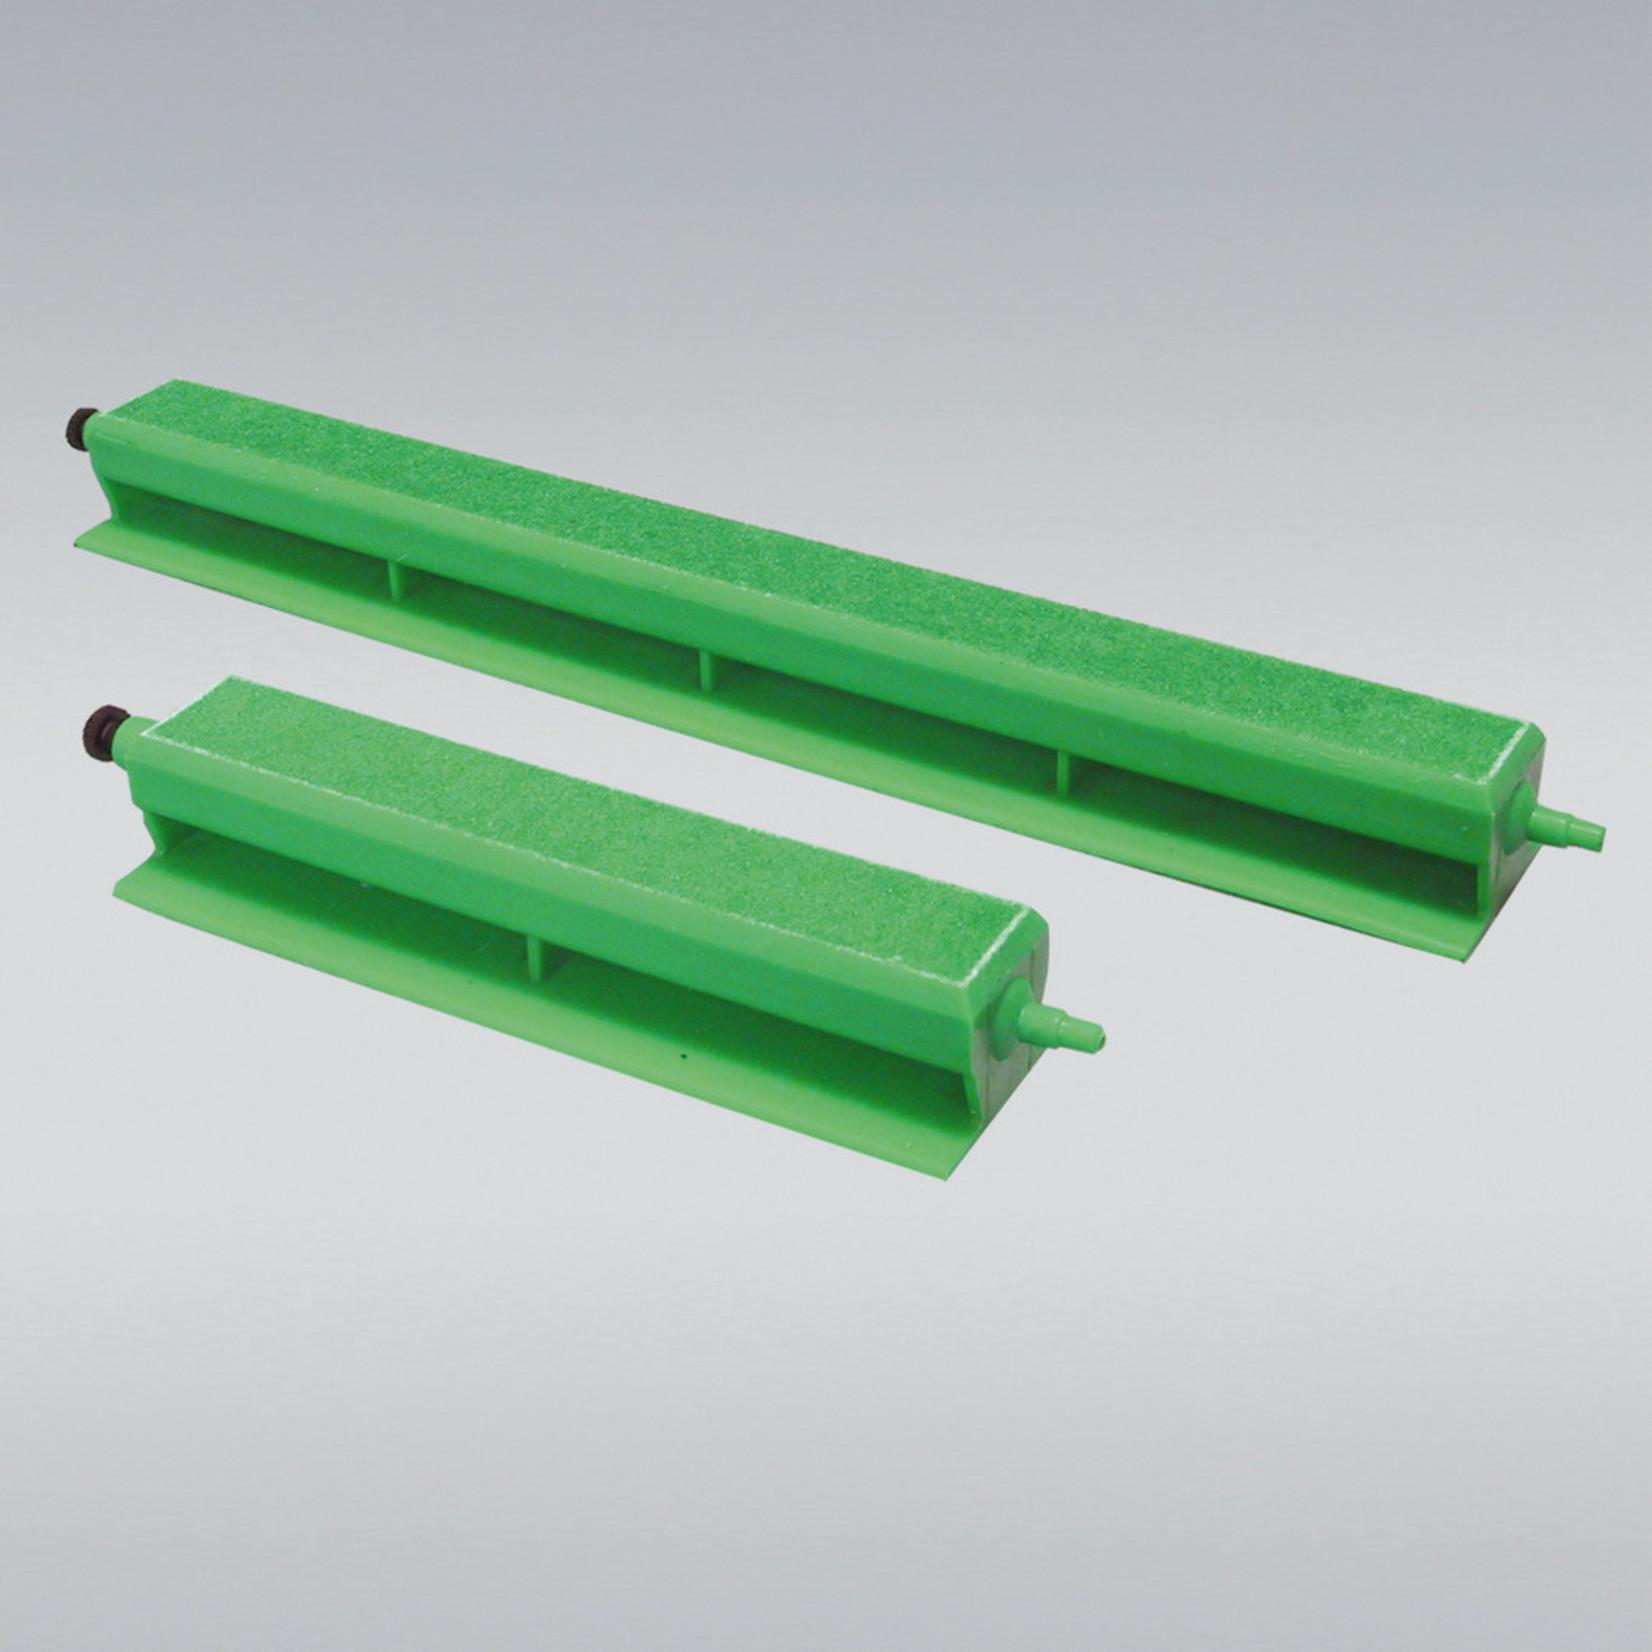 JBL ProSilent Aeras Micro + diffusers